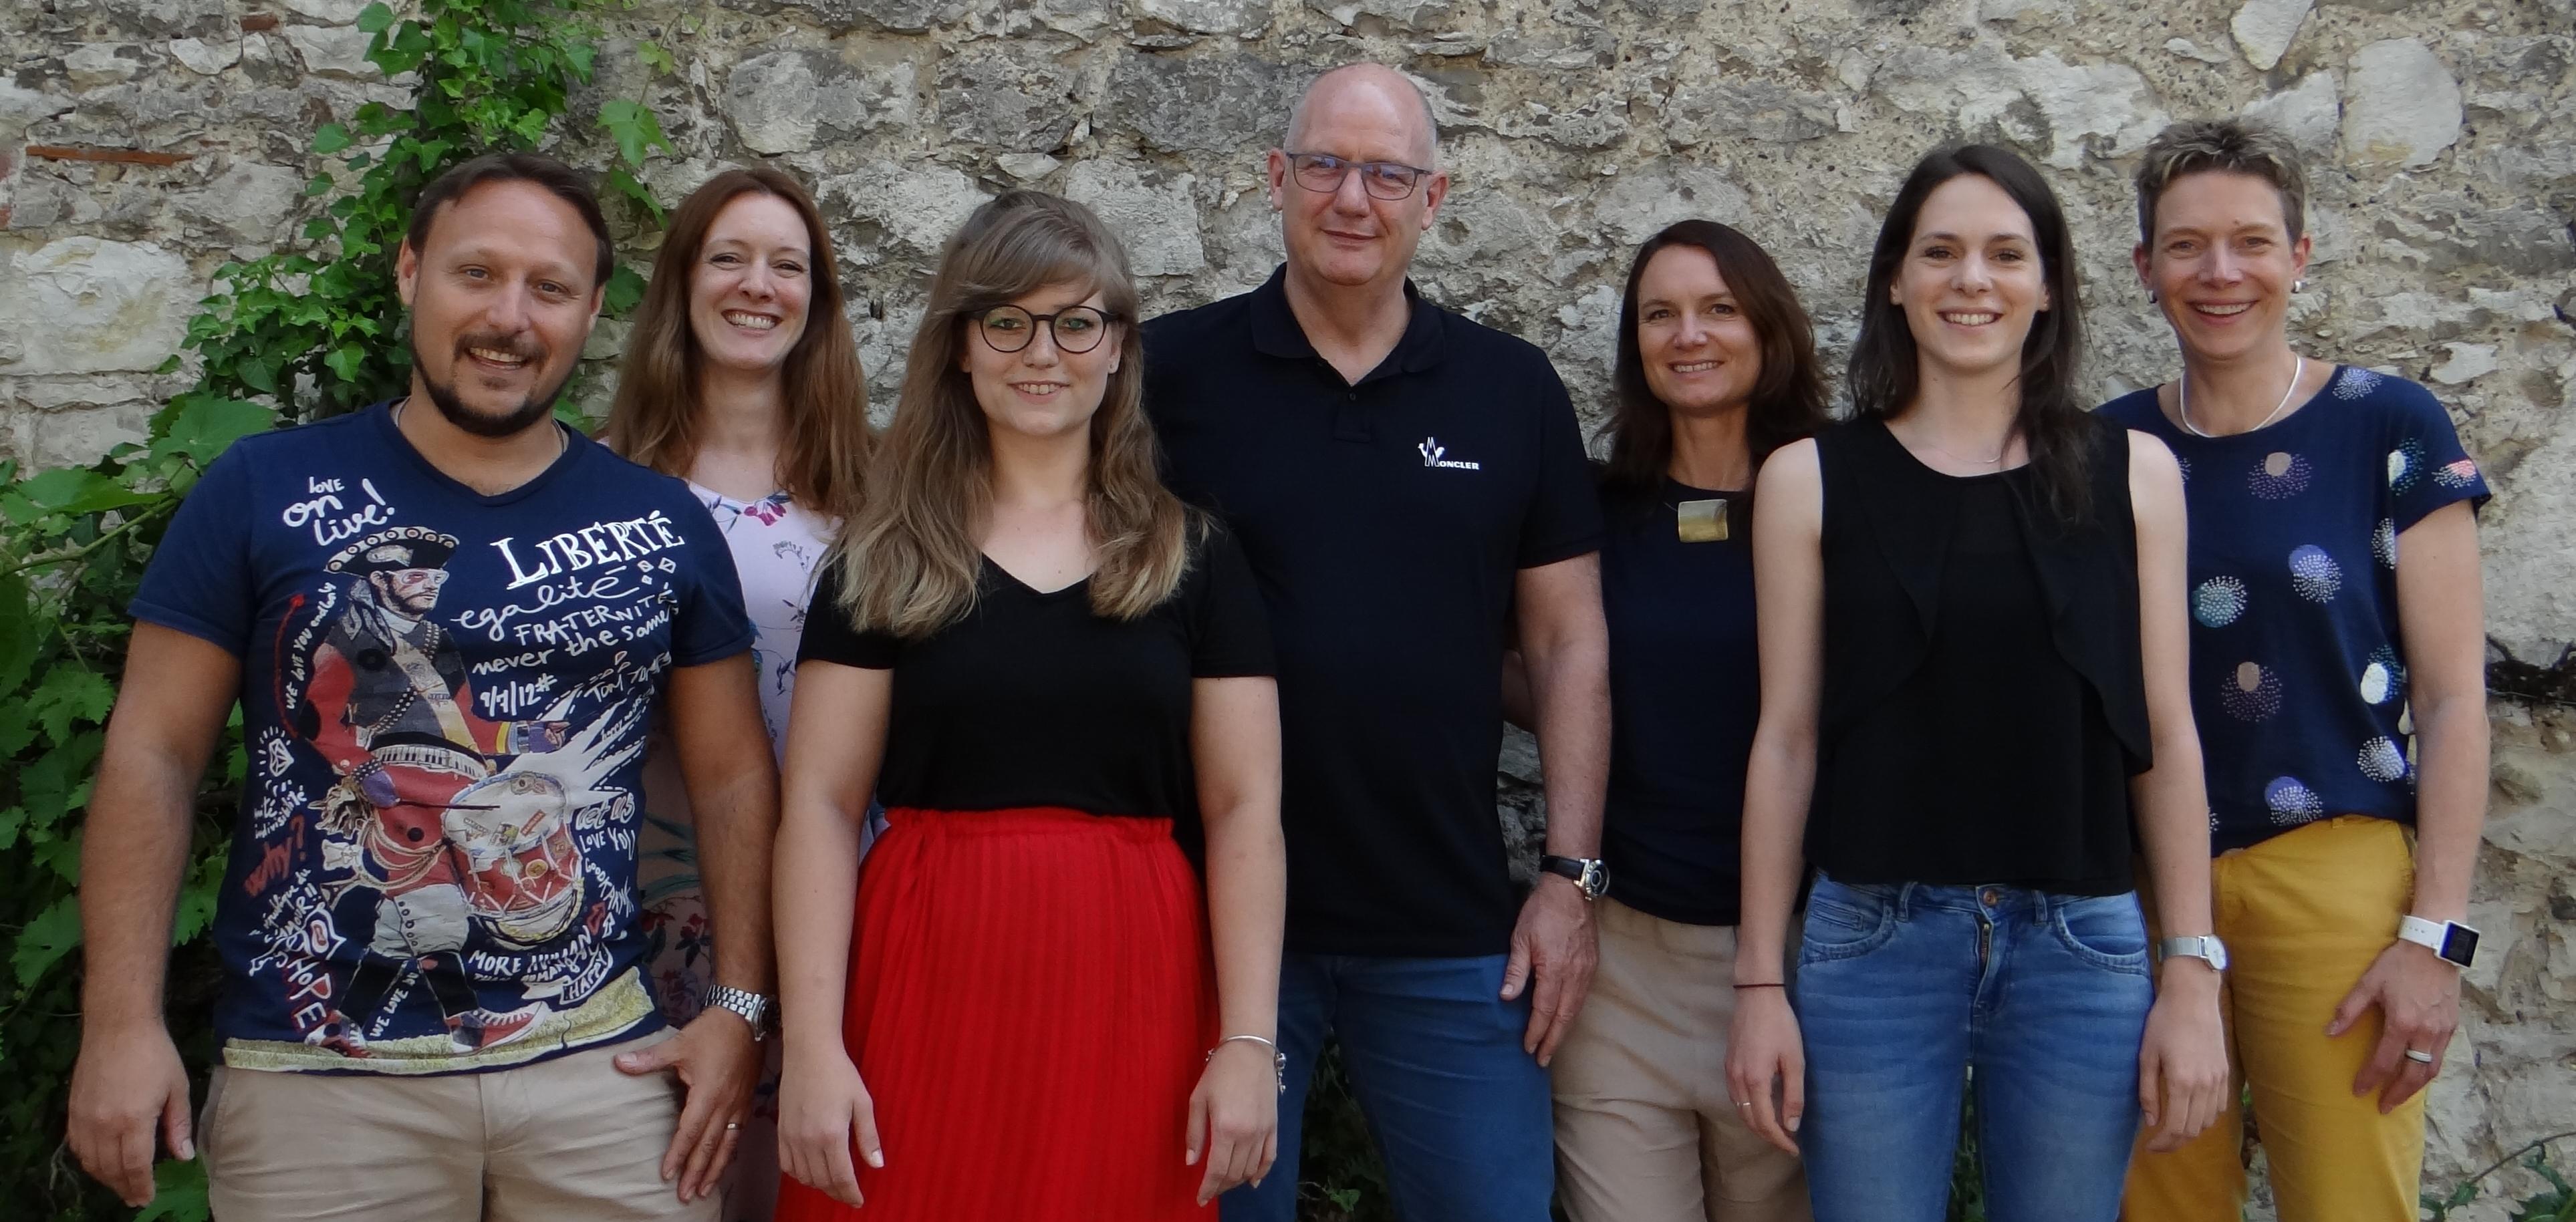 Team Praxis Dr Bertin Vater